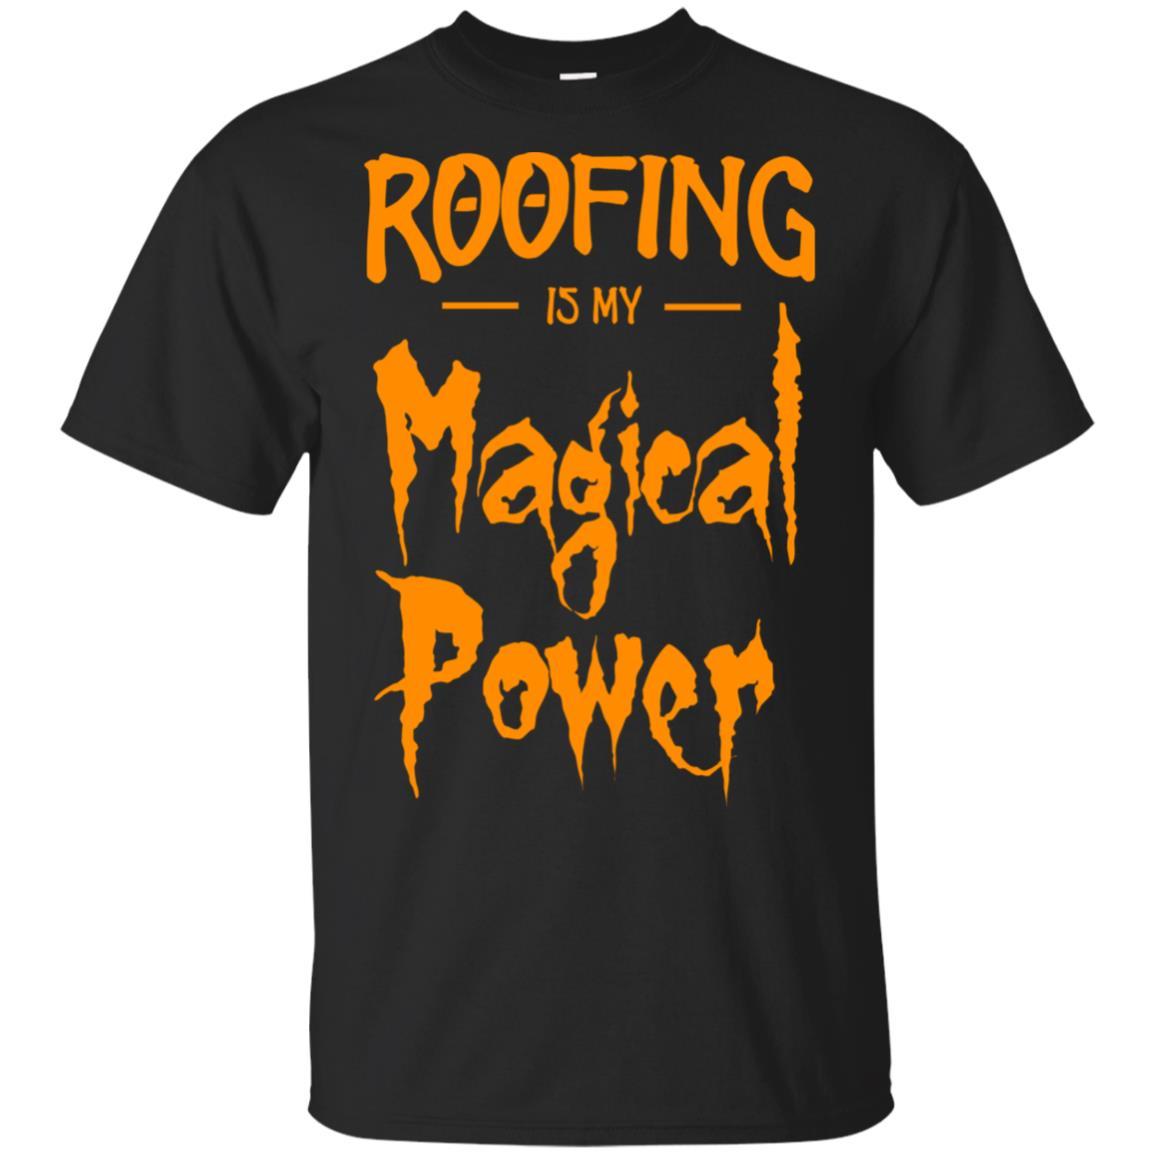 Roofing Funny Halloween Costume Gift Unisex Short Sleeve